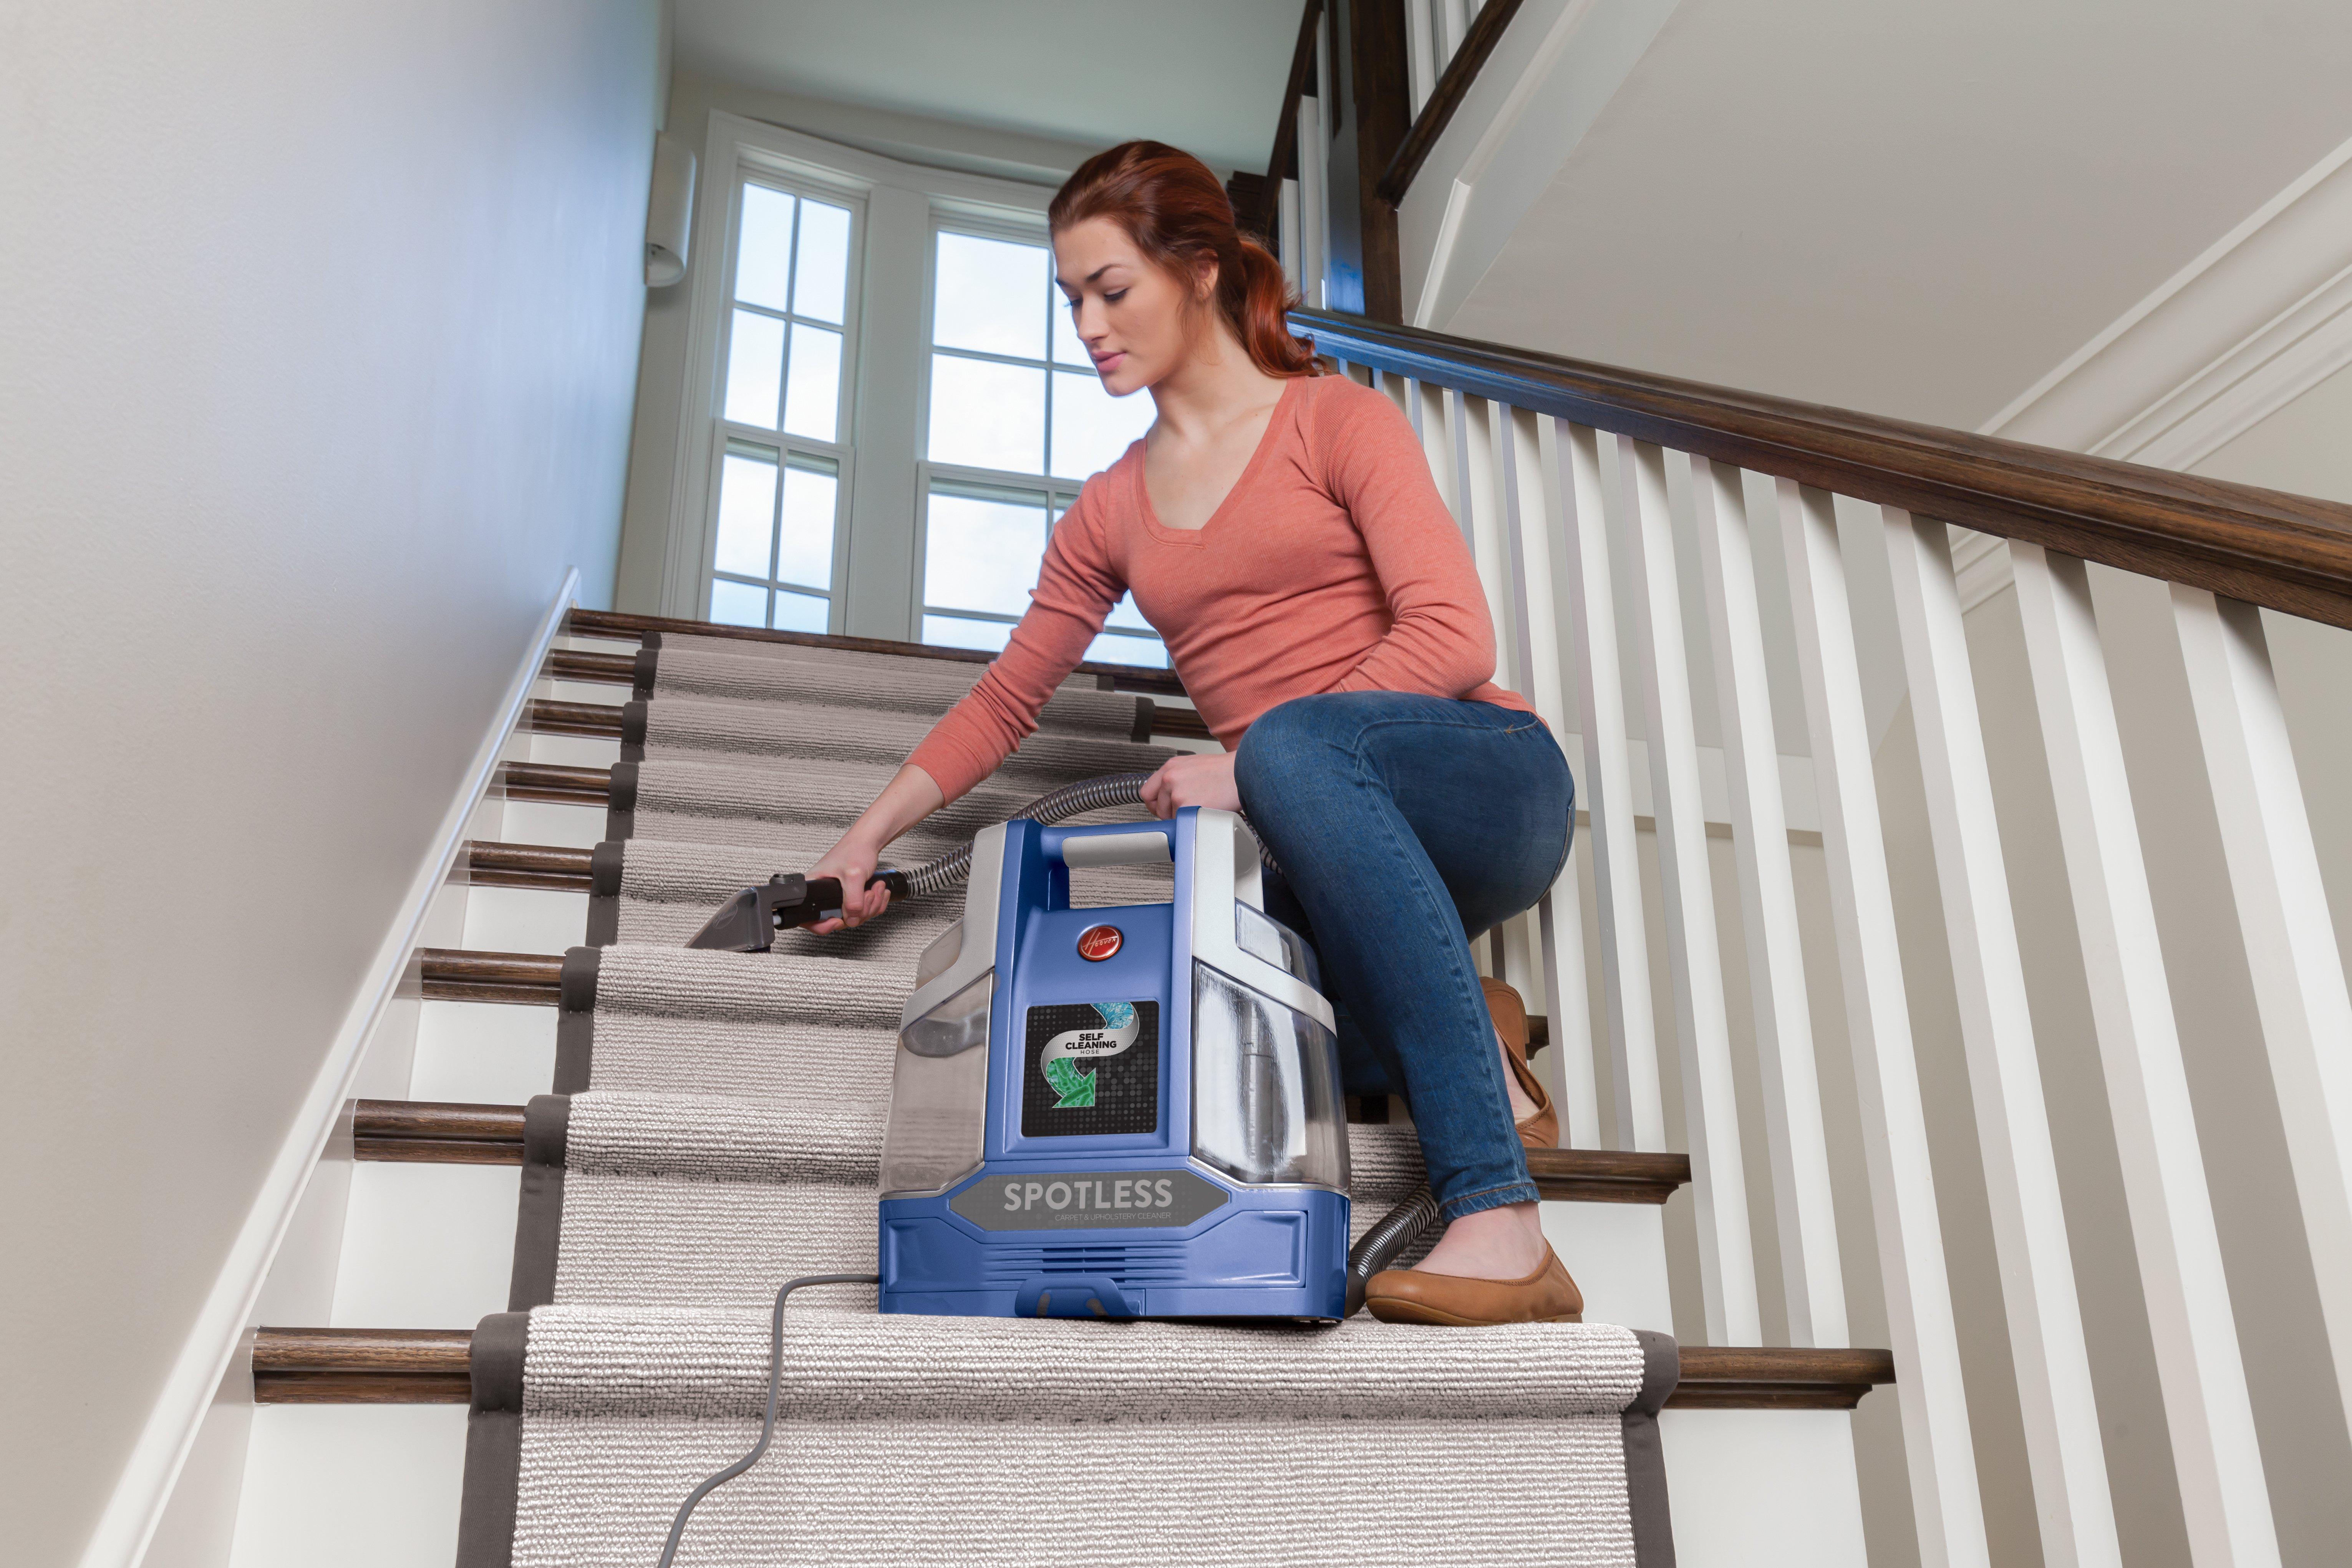 Spotless Portable Carpet & Upholstery Cleaner4